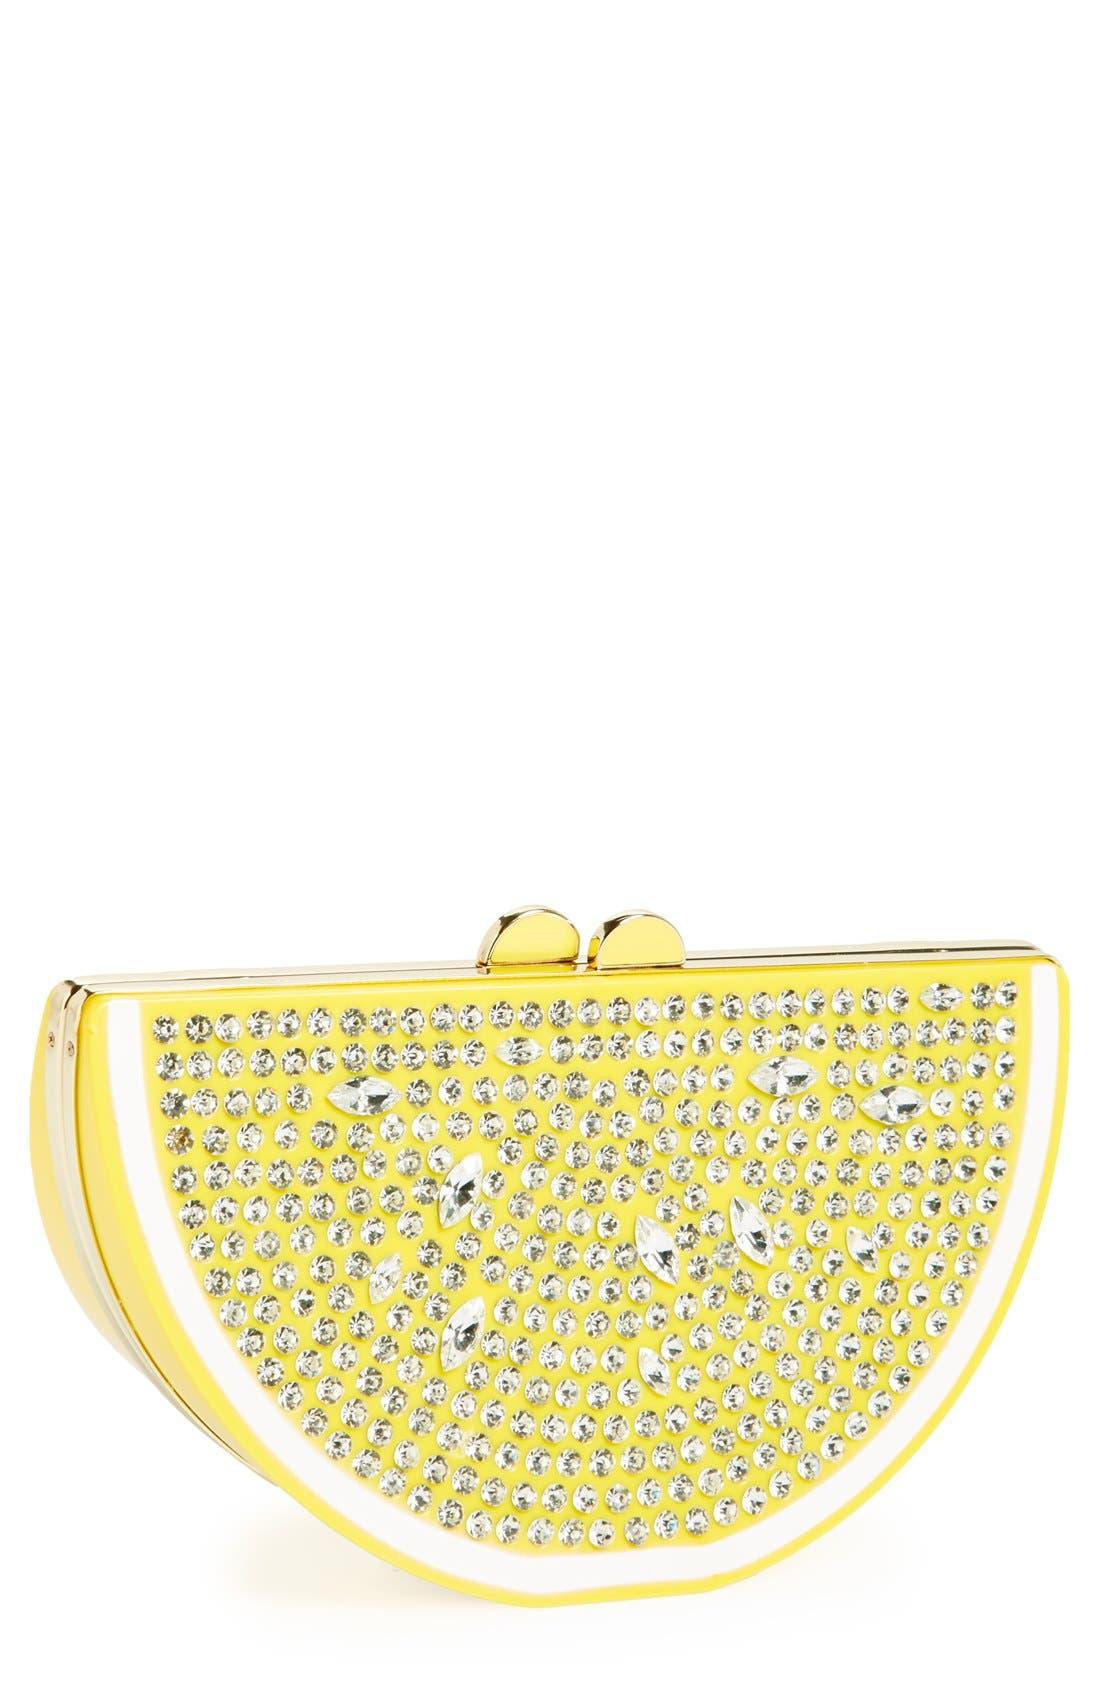 Main Image - kate spade new york 'via limoni - lina' clutch